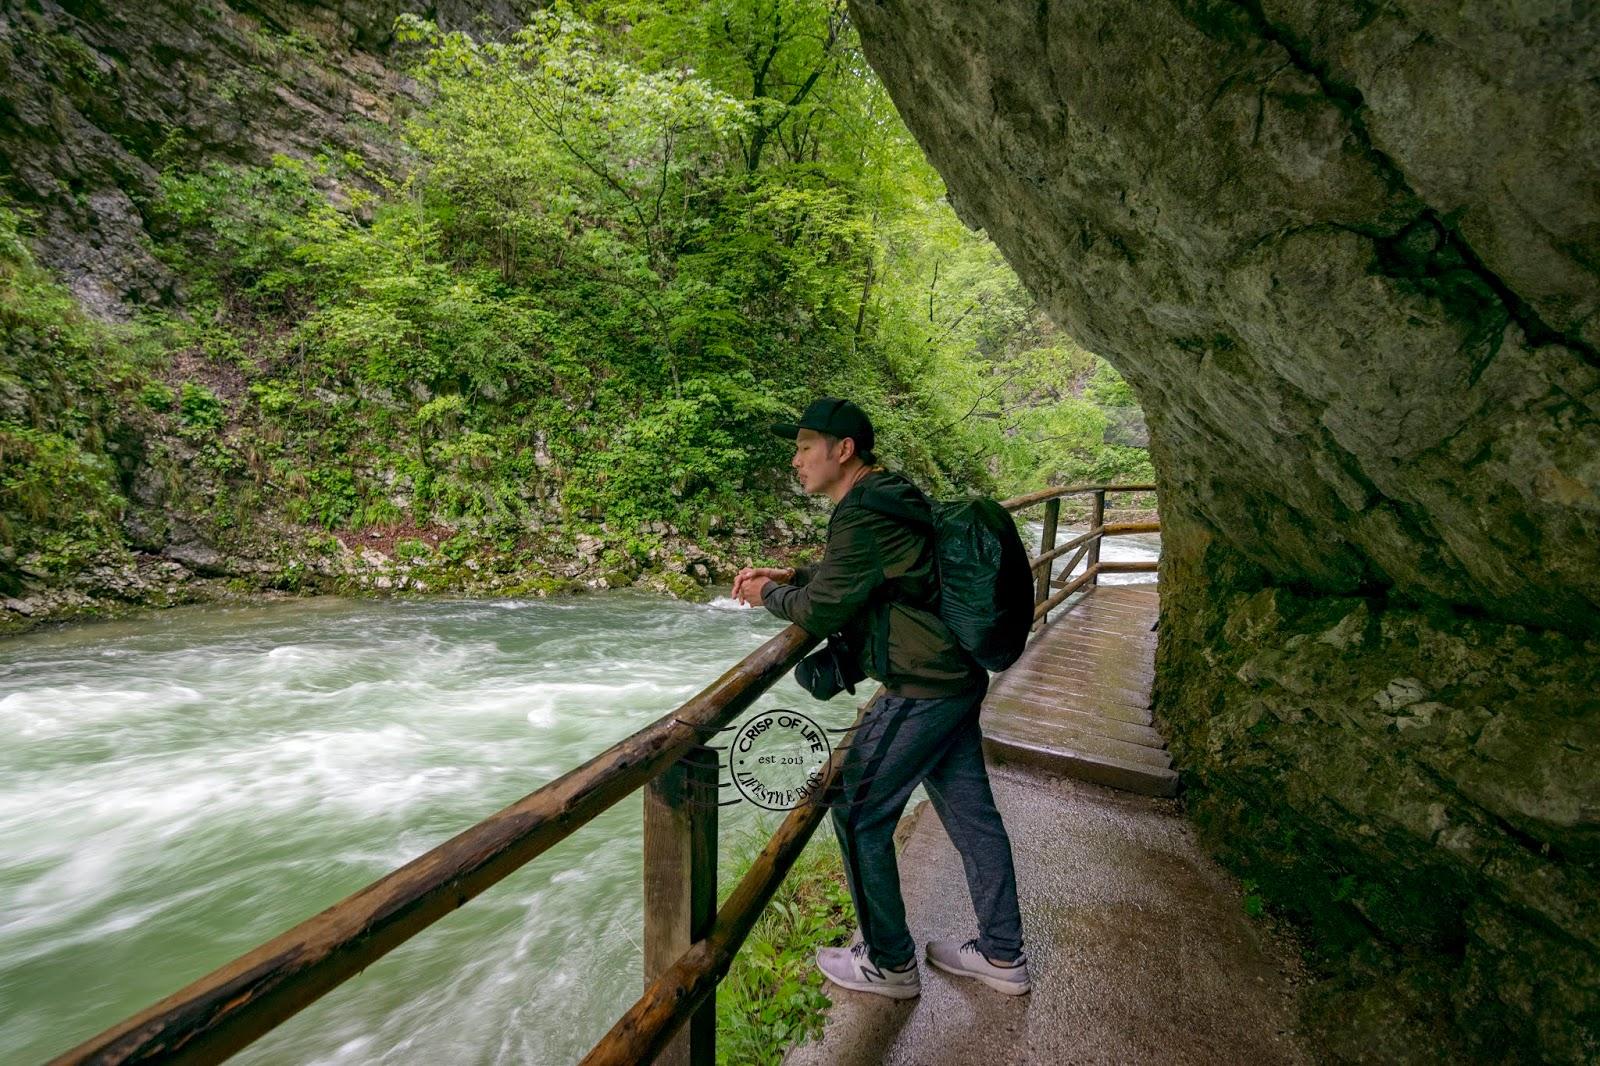 Trip to Lake Bled and Vintgar Gorge, Slovenia